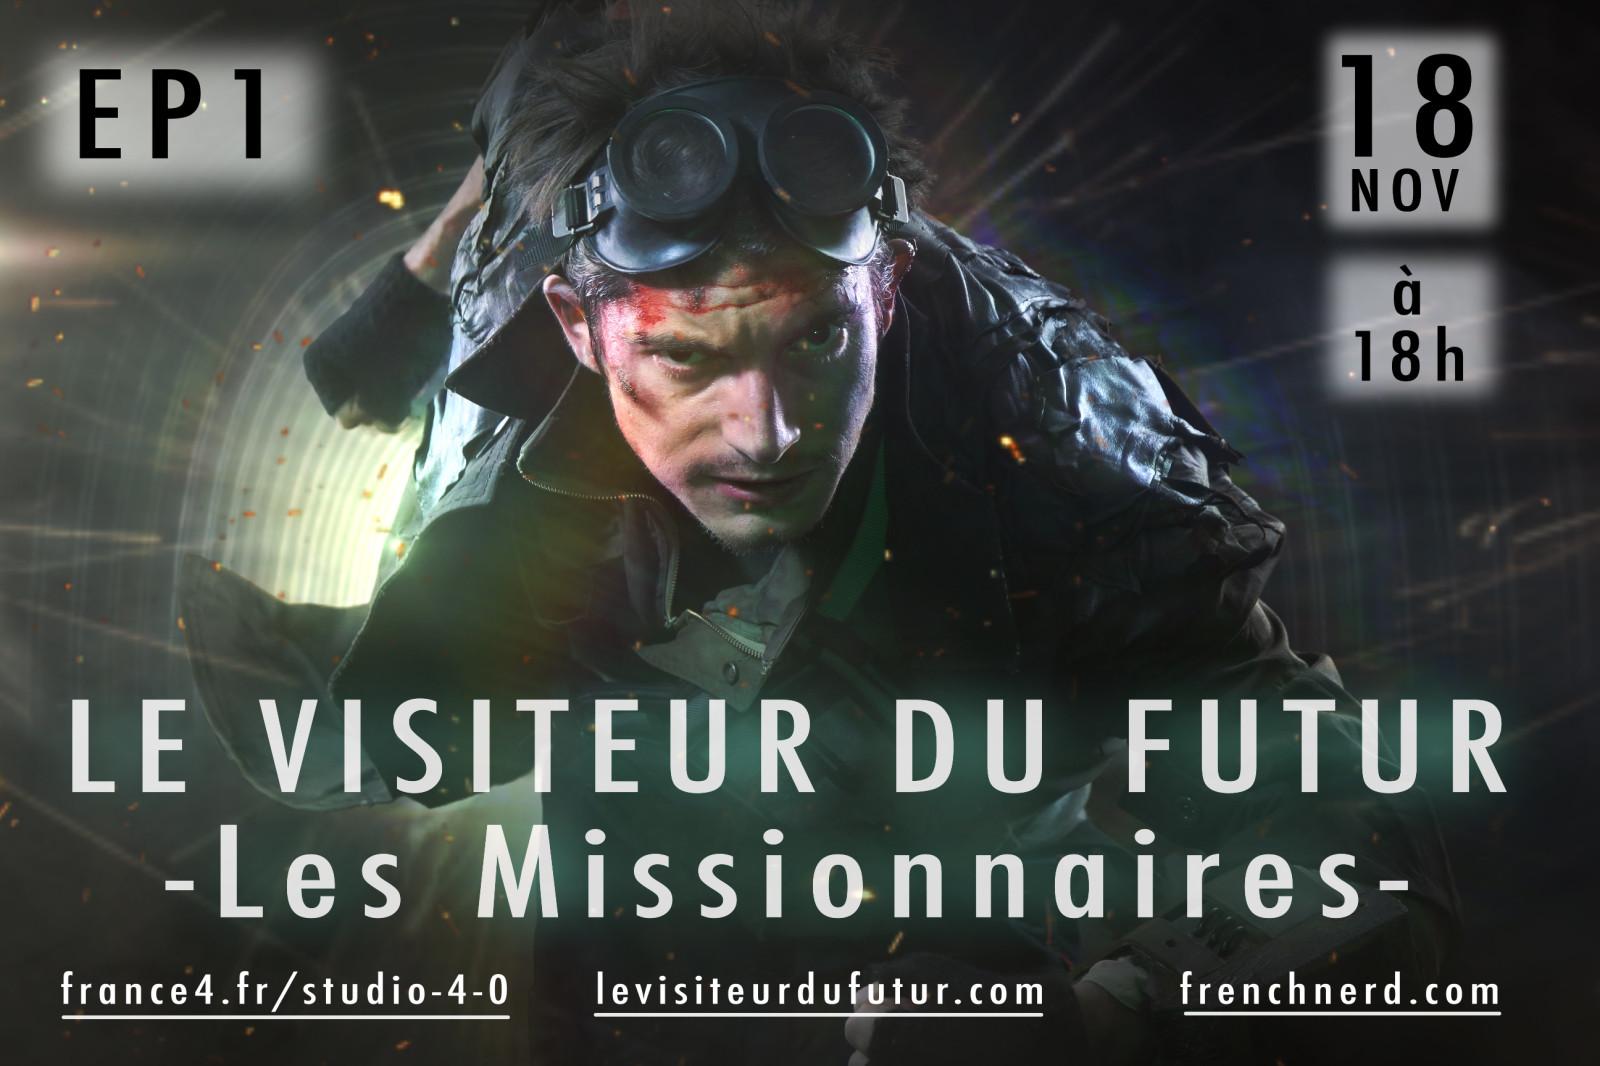 VDF-Missionnaire-Sortie-Ep1.jpg